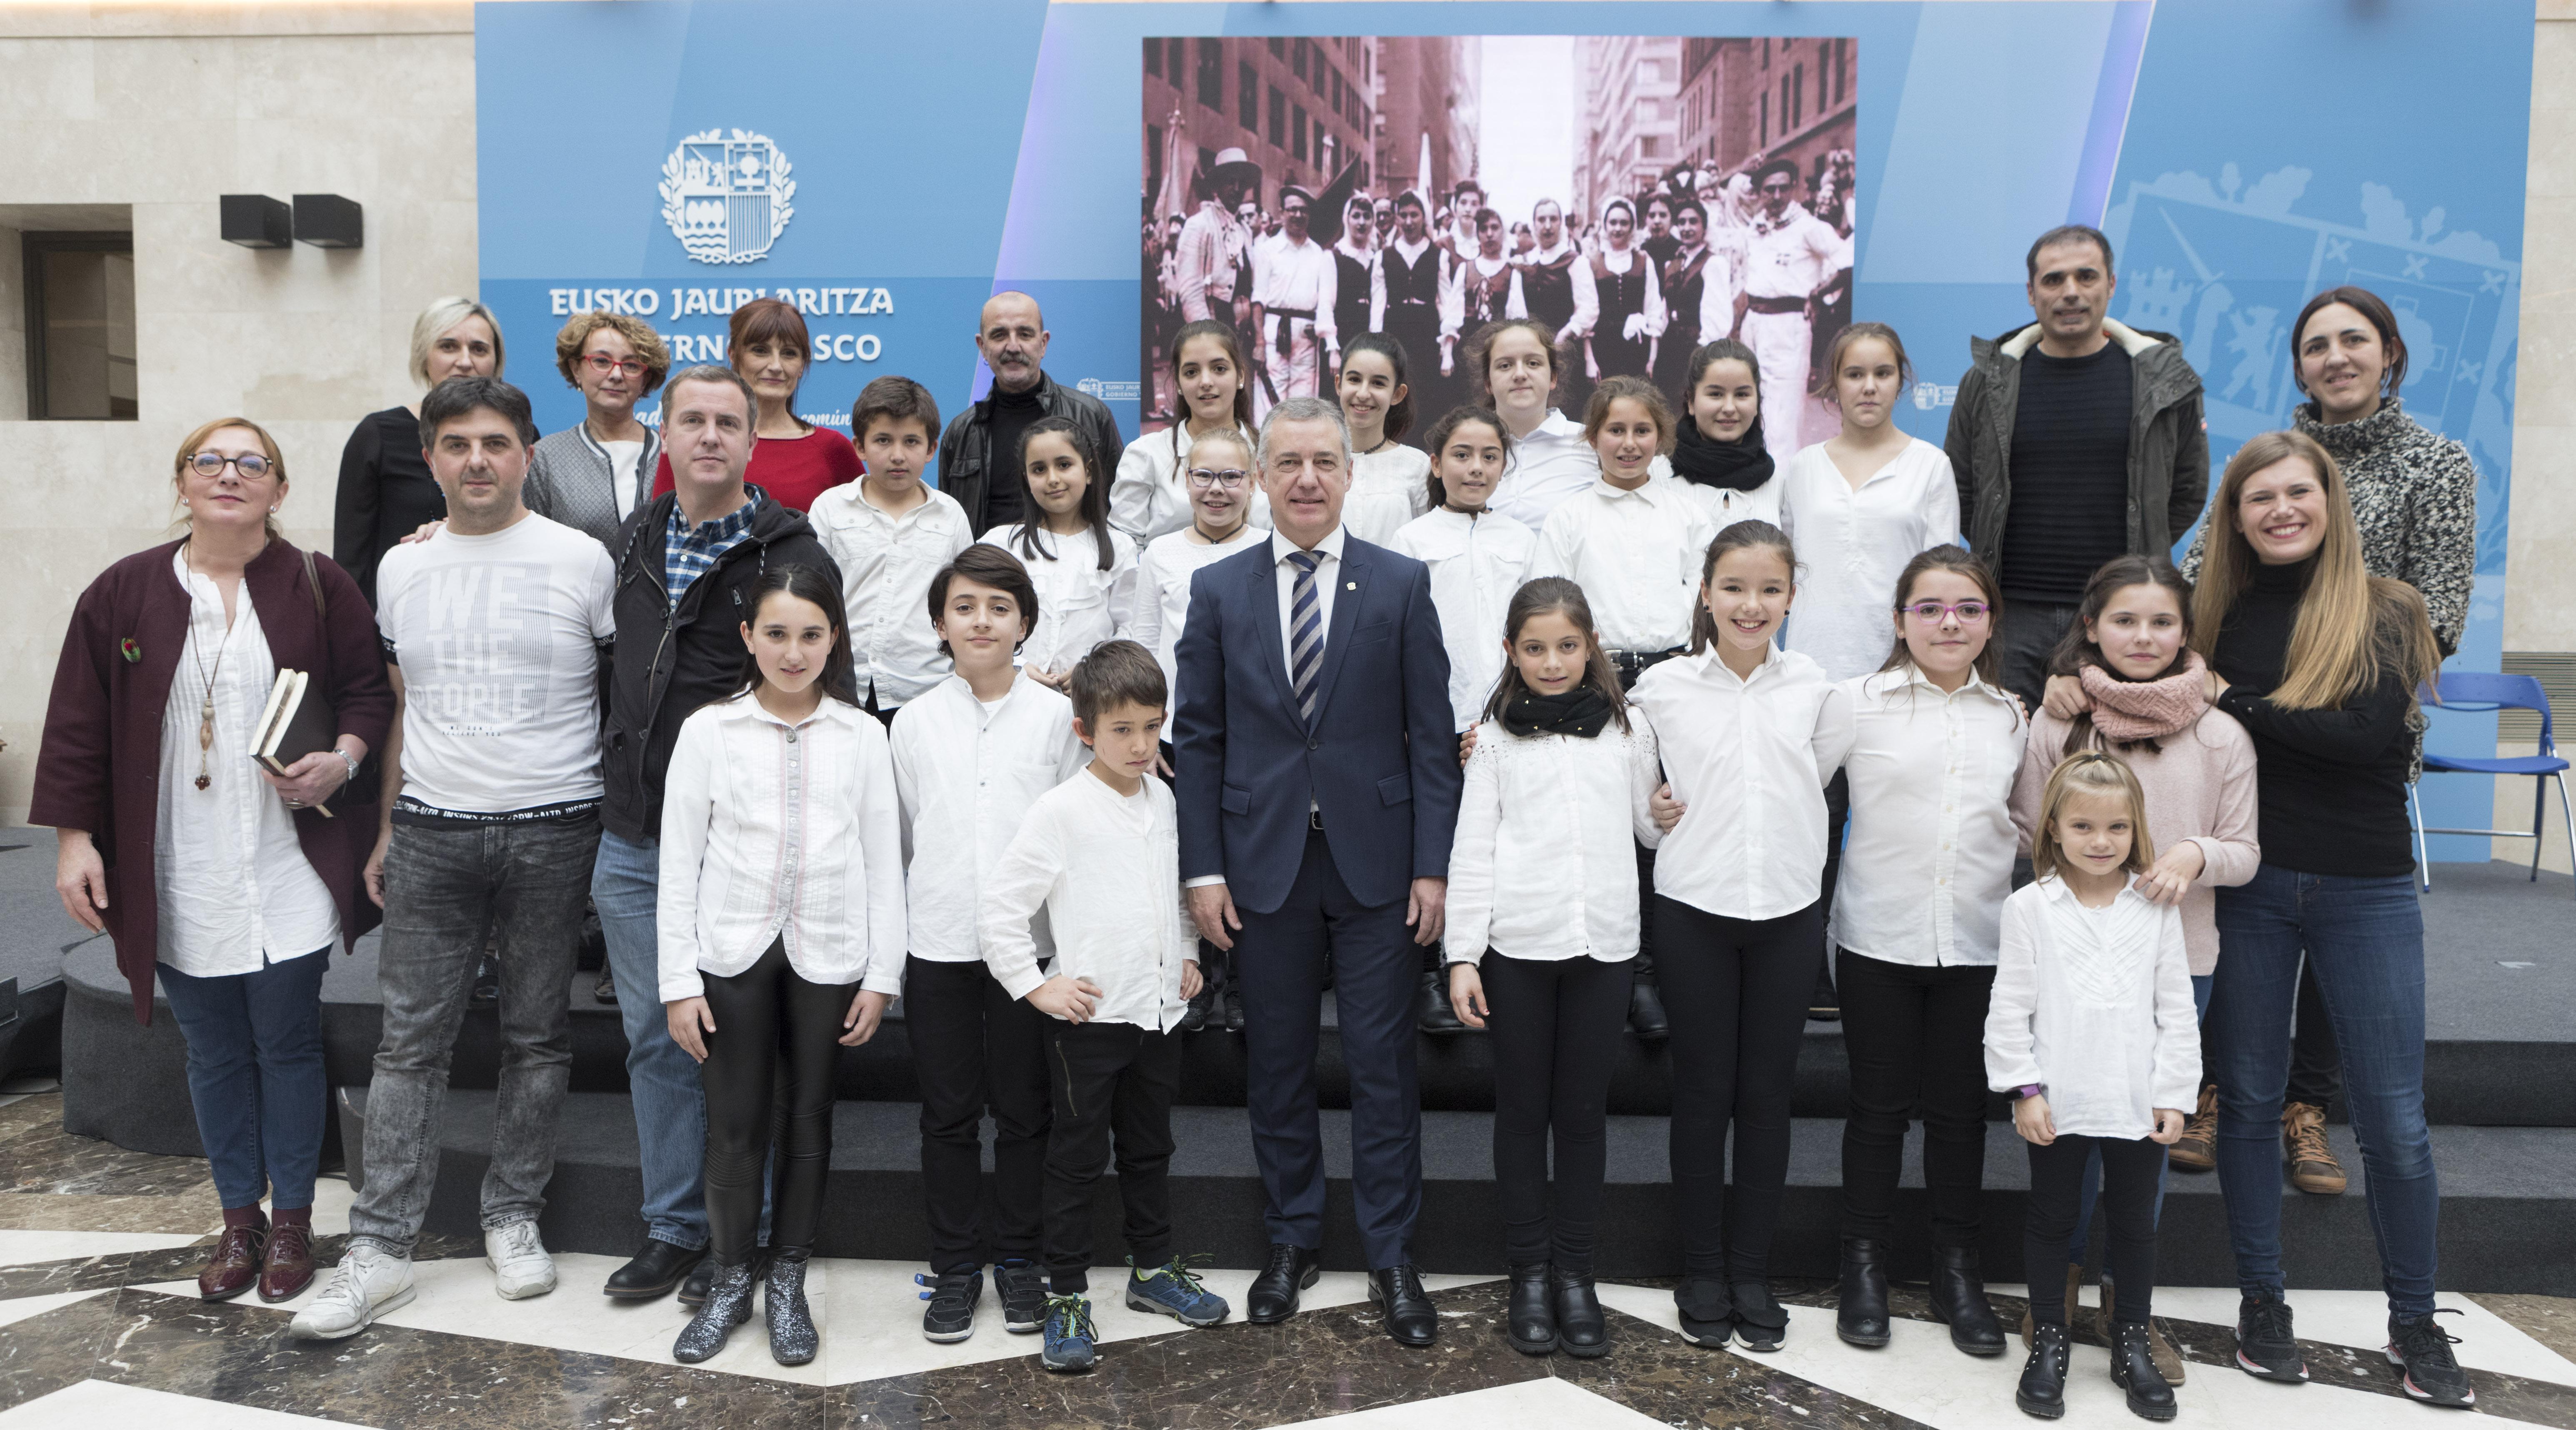 20181130_lhk_delegaciones_128.jpg